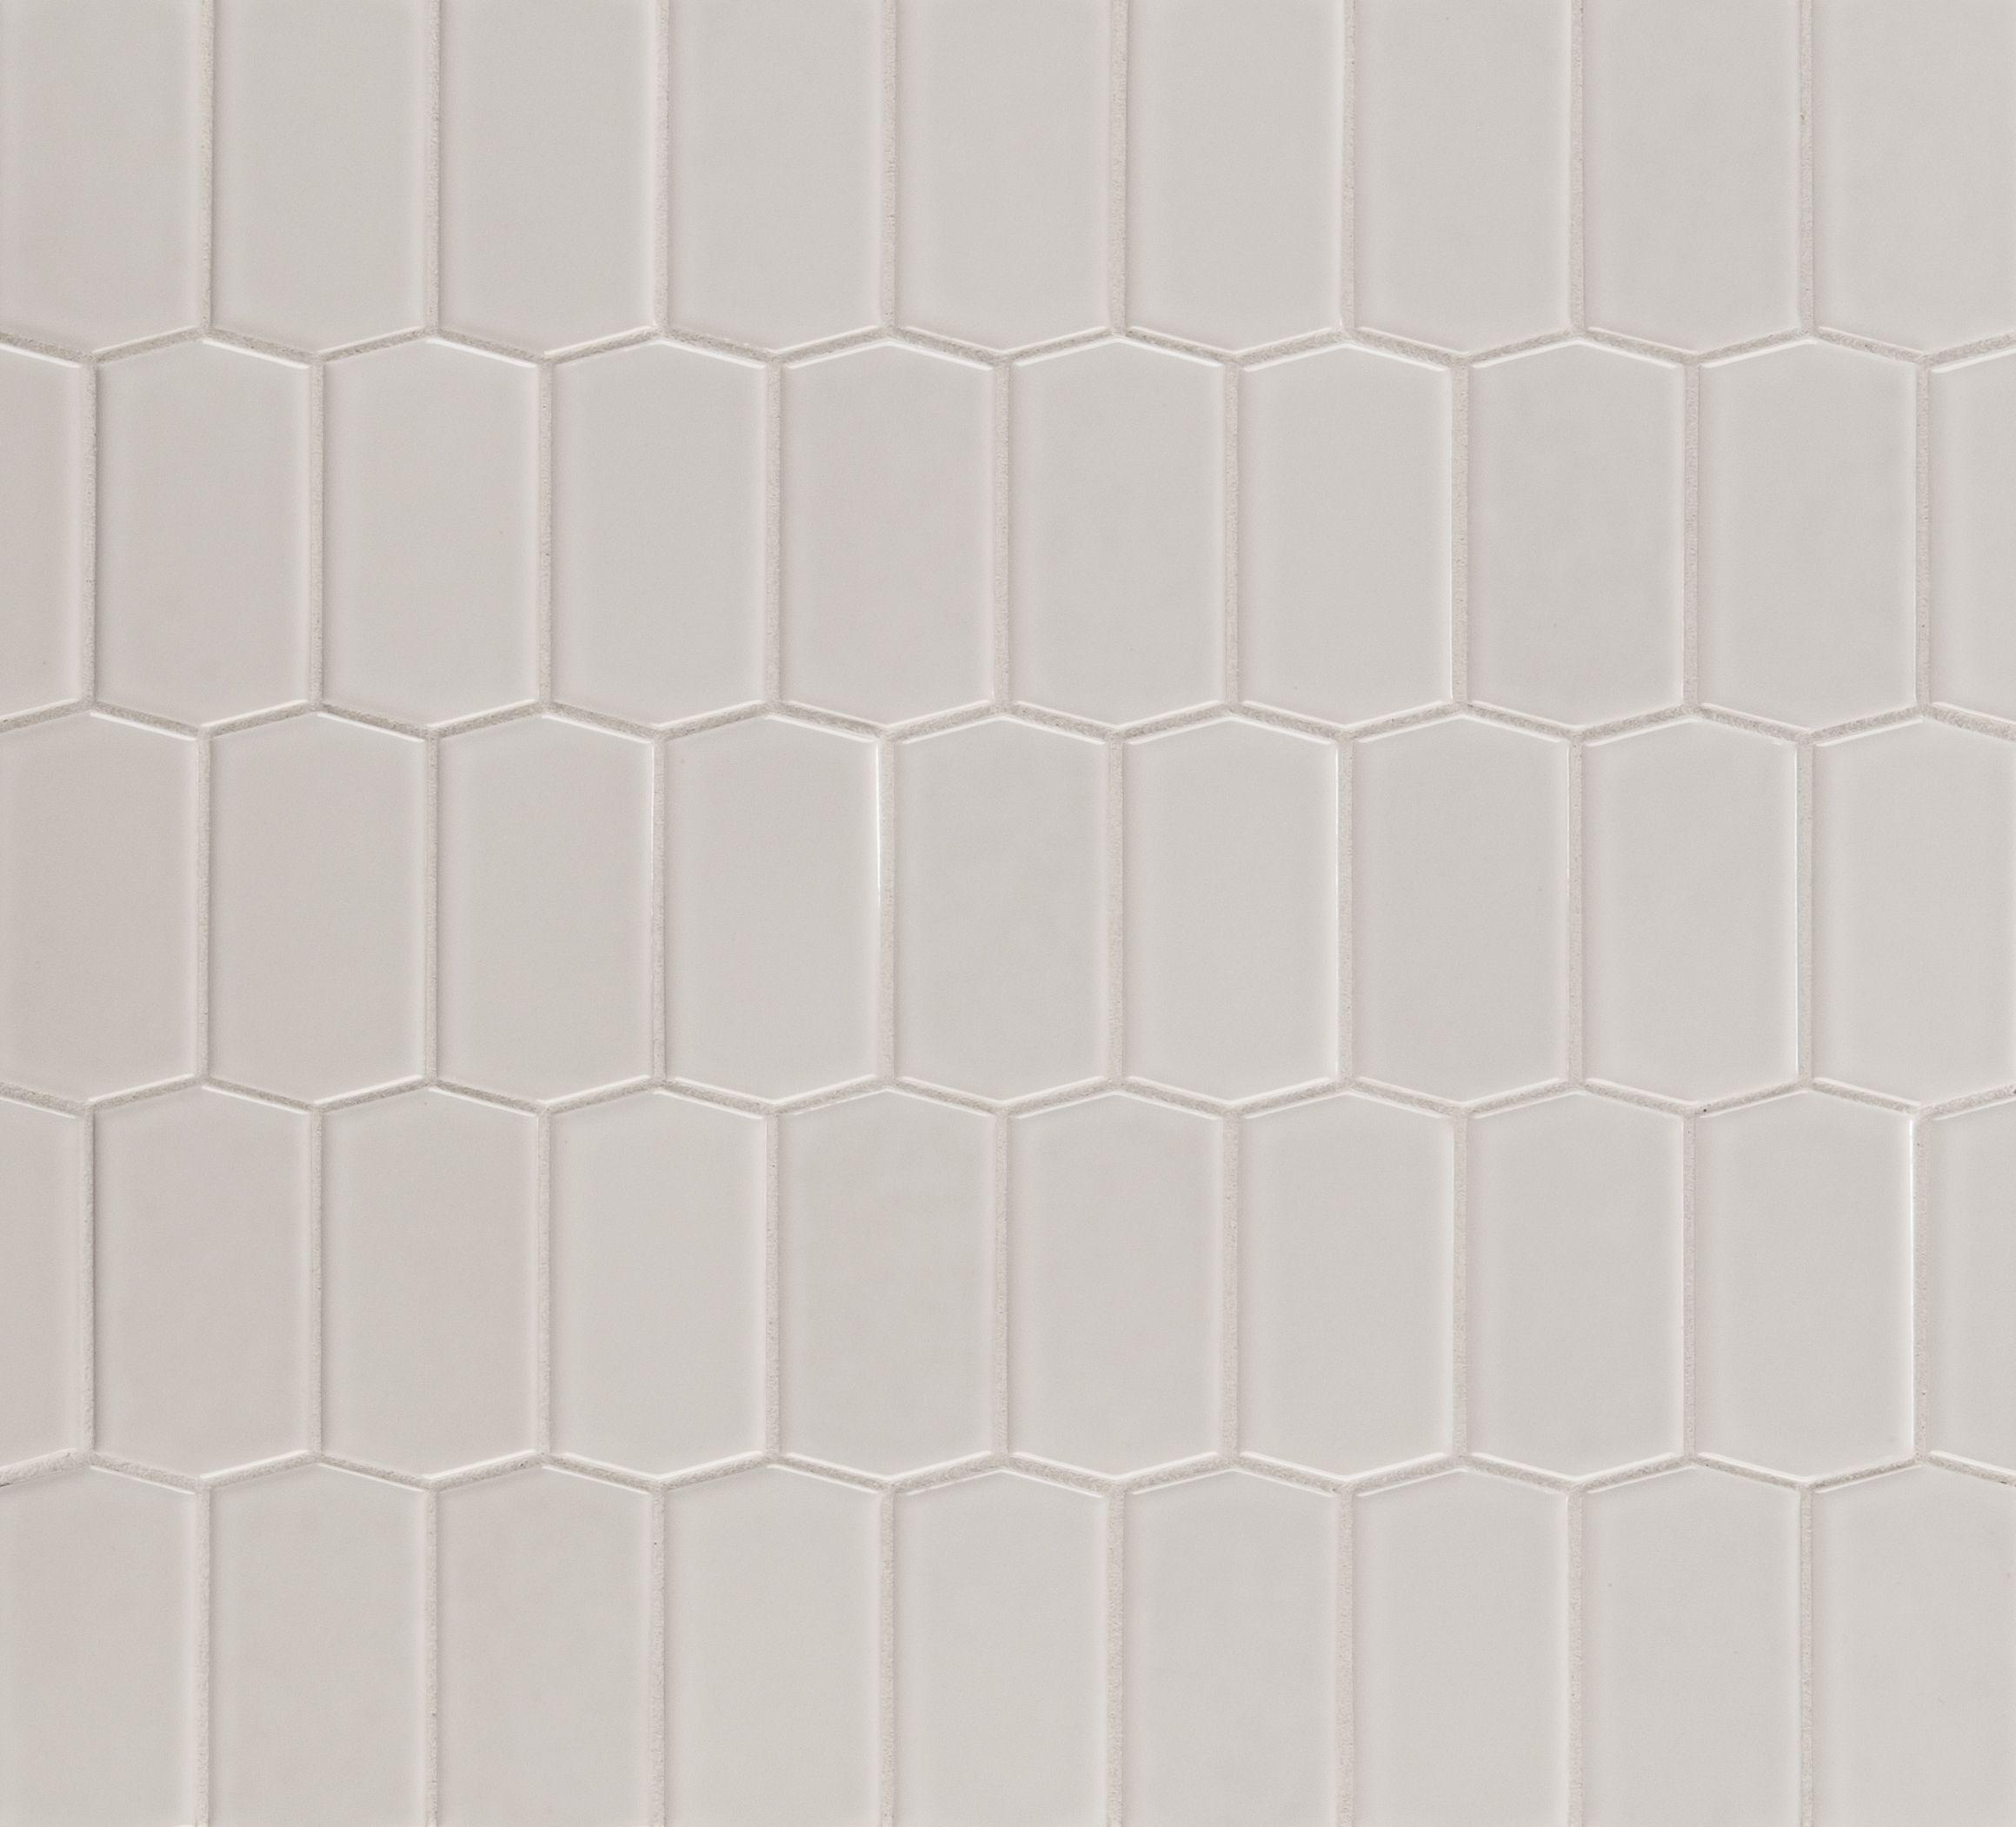 Ann Sacks Savoy Hive Ceramic Mosaic In Paperwhite